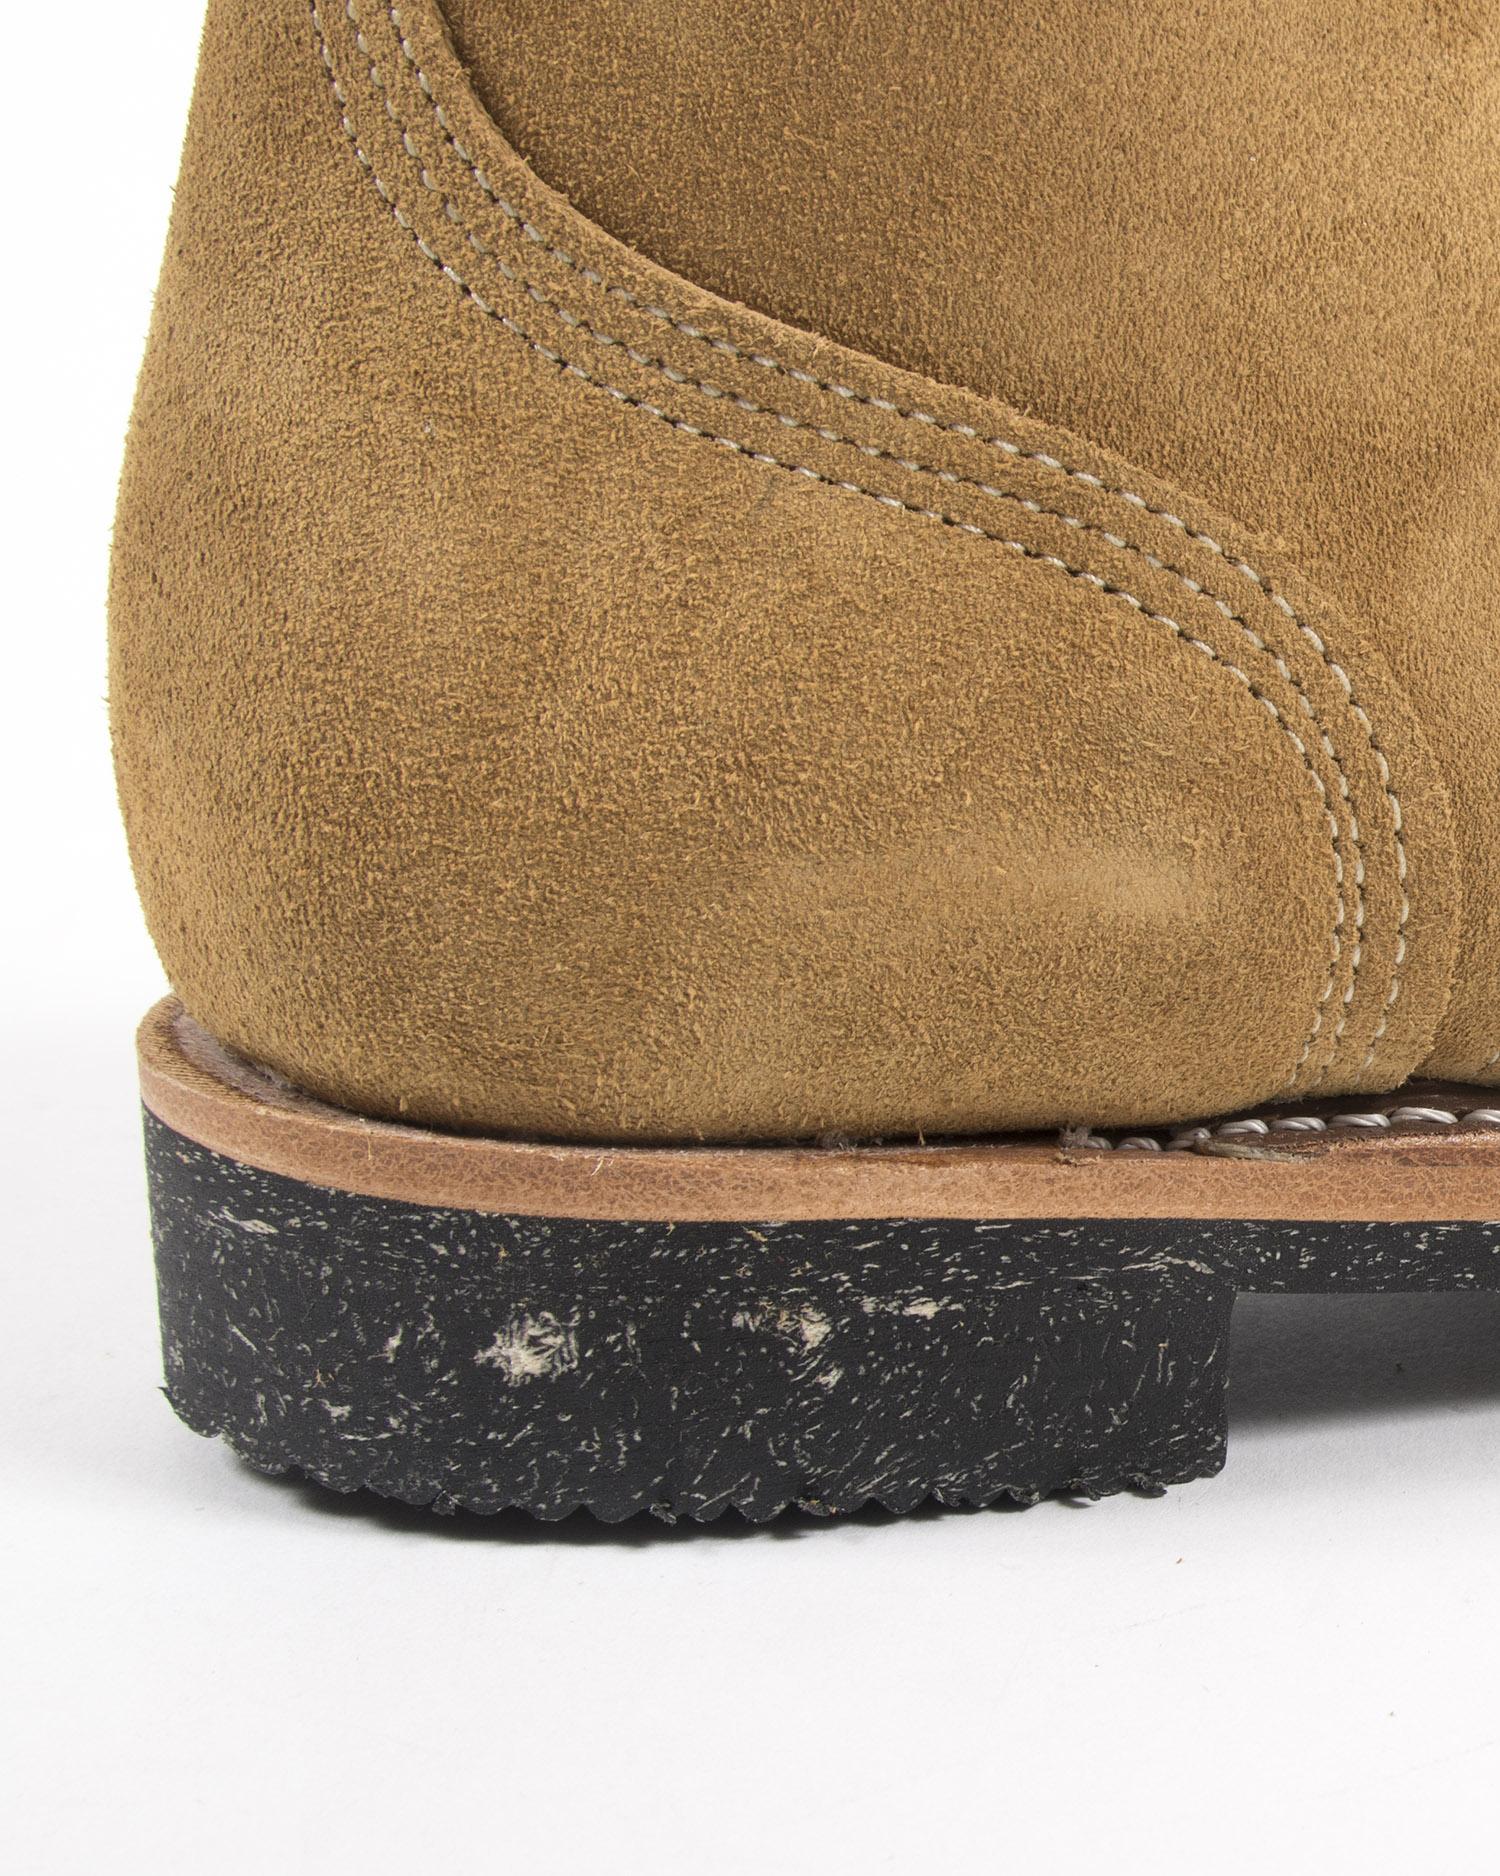 N1 Field Shoes